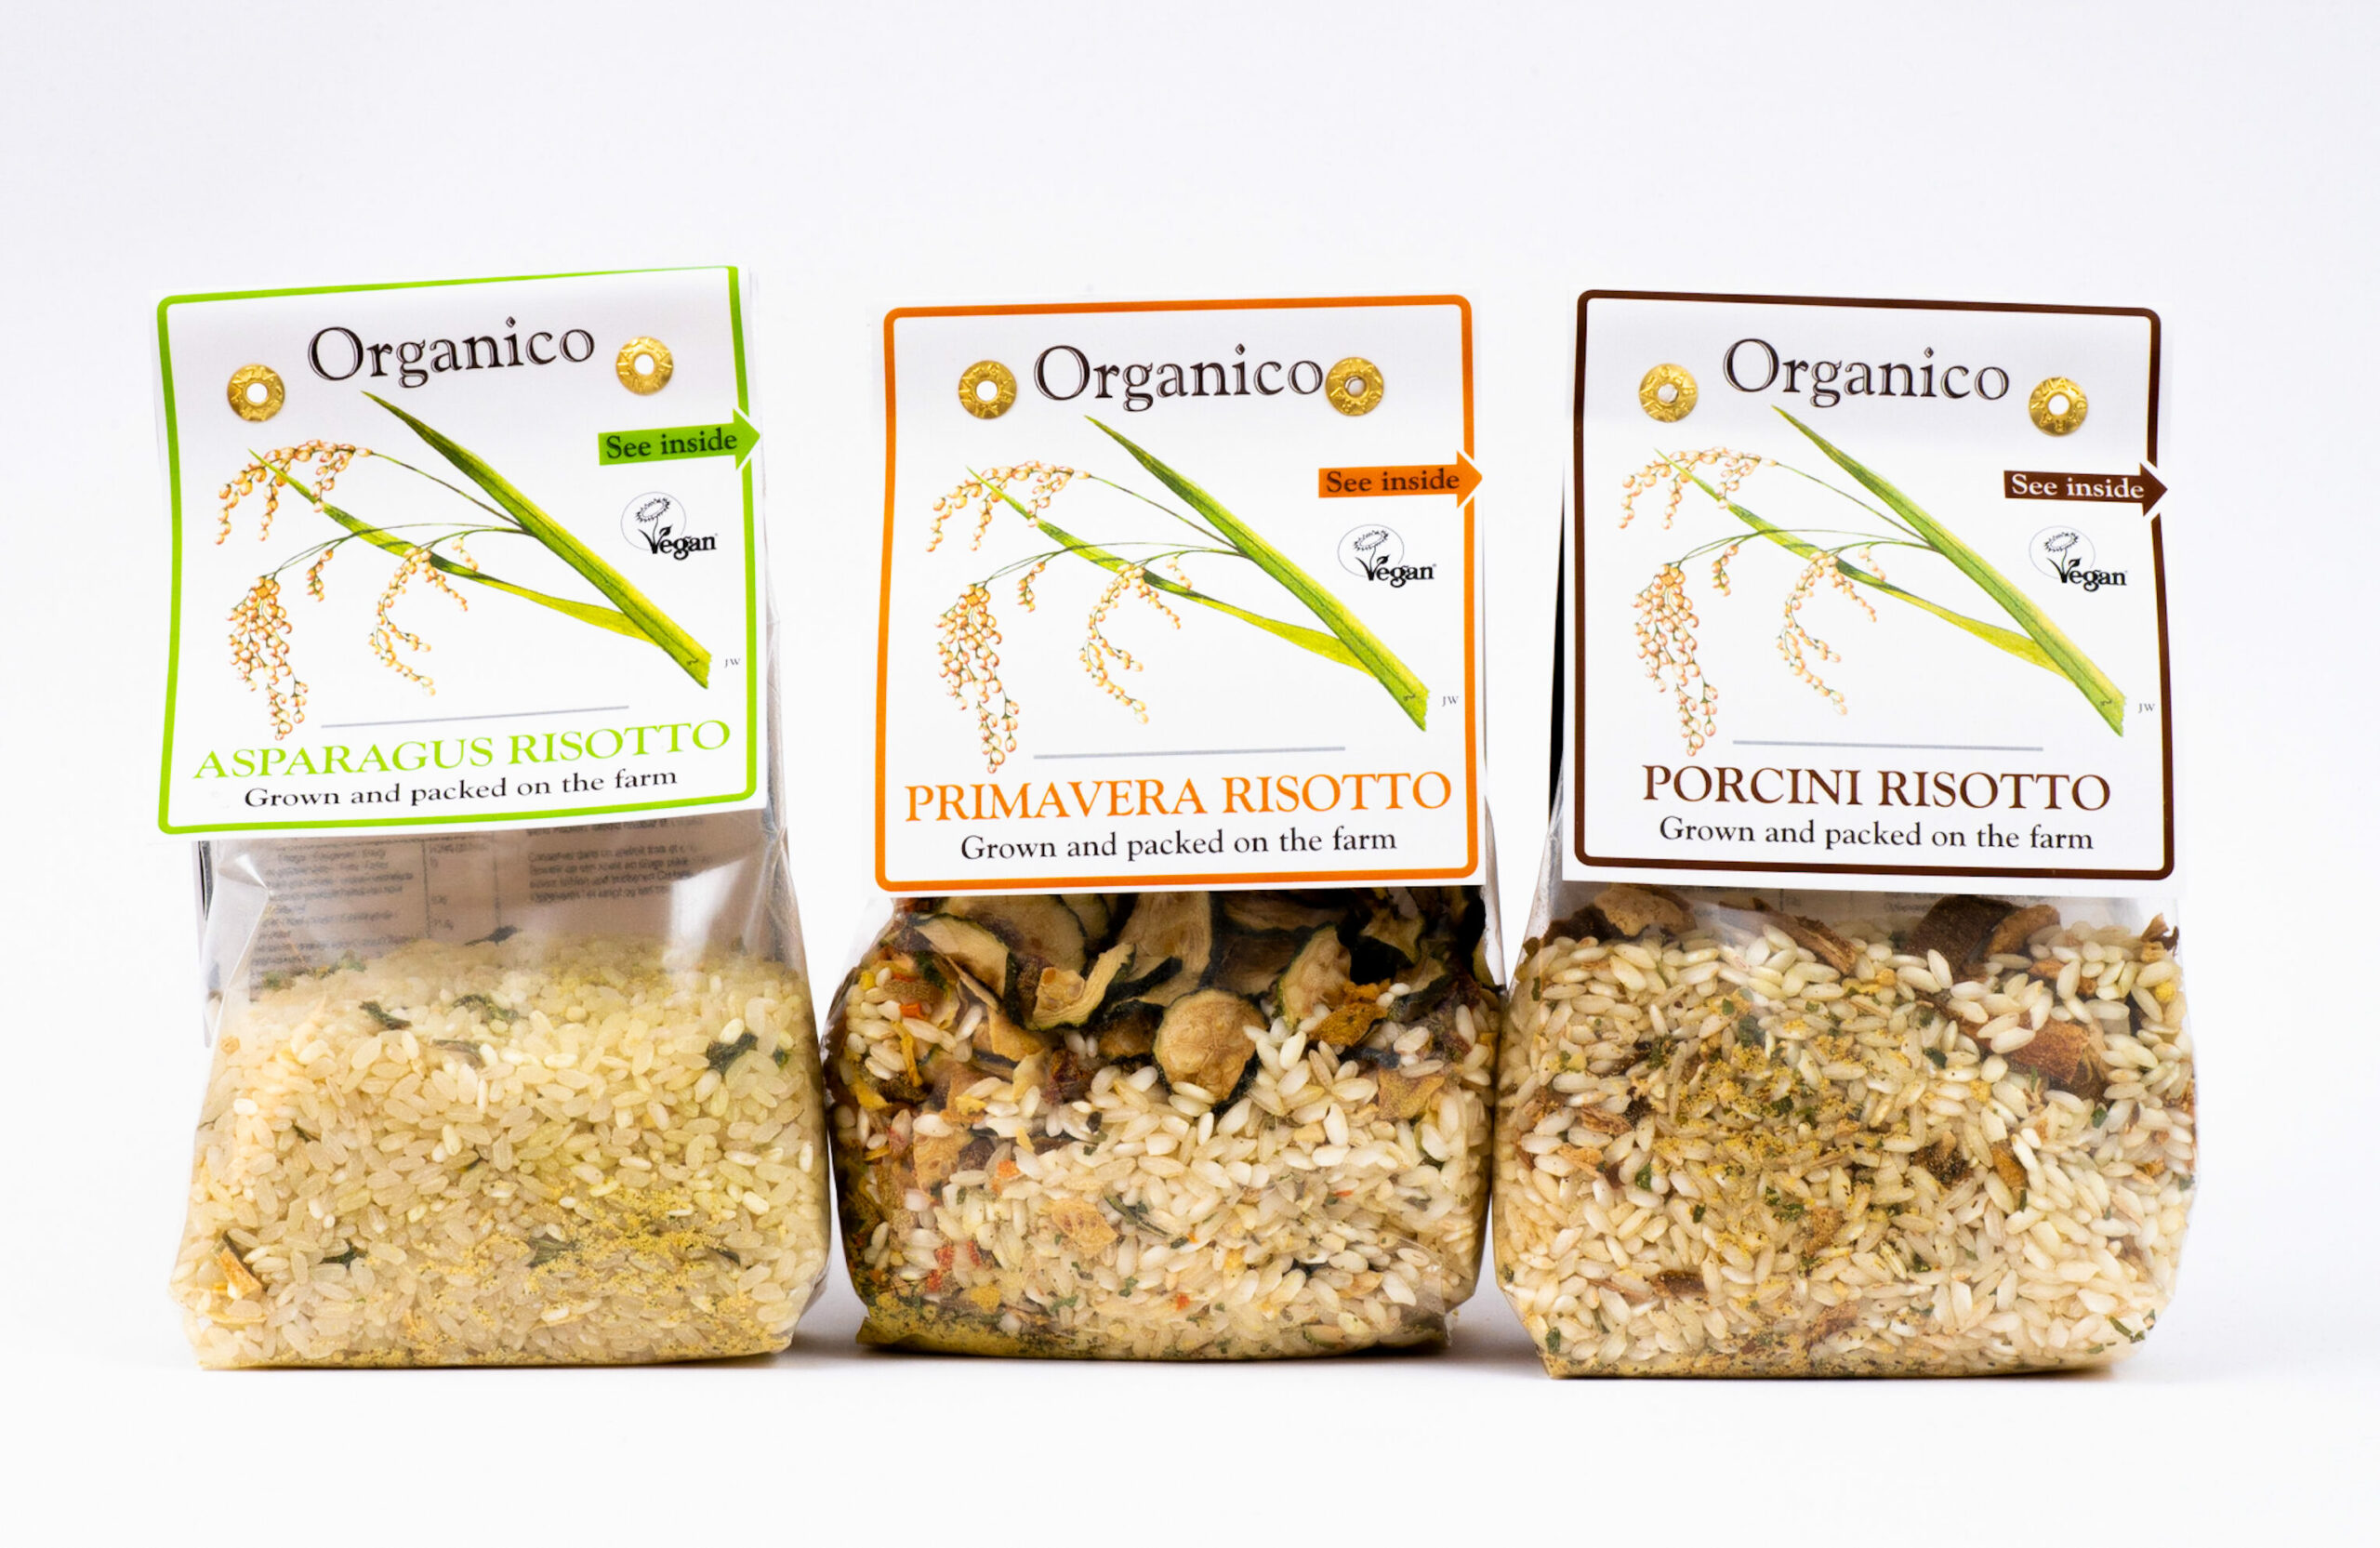 Organic brand: Organico rice